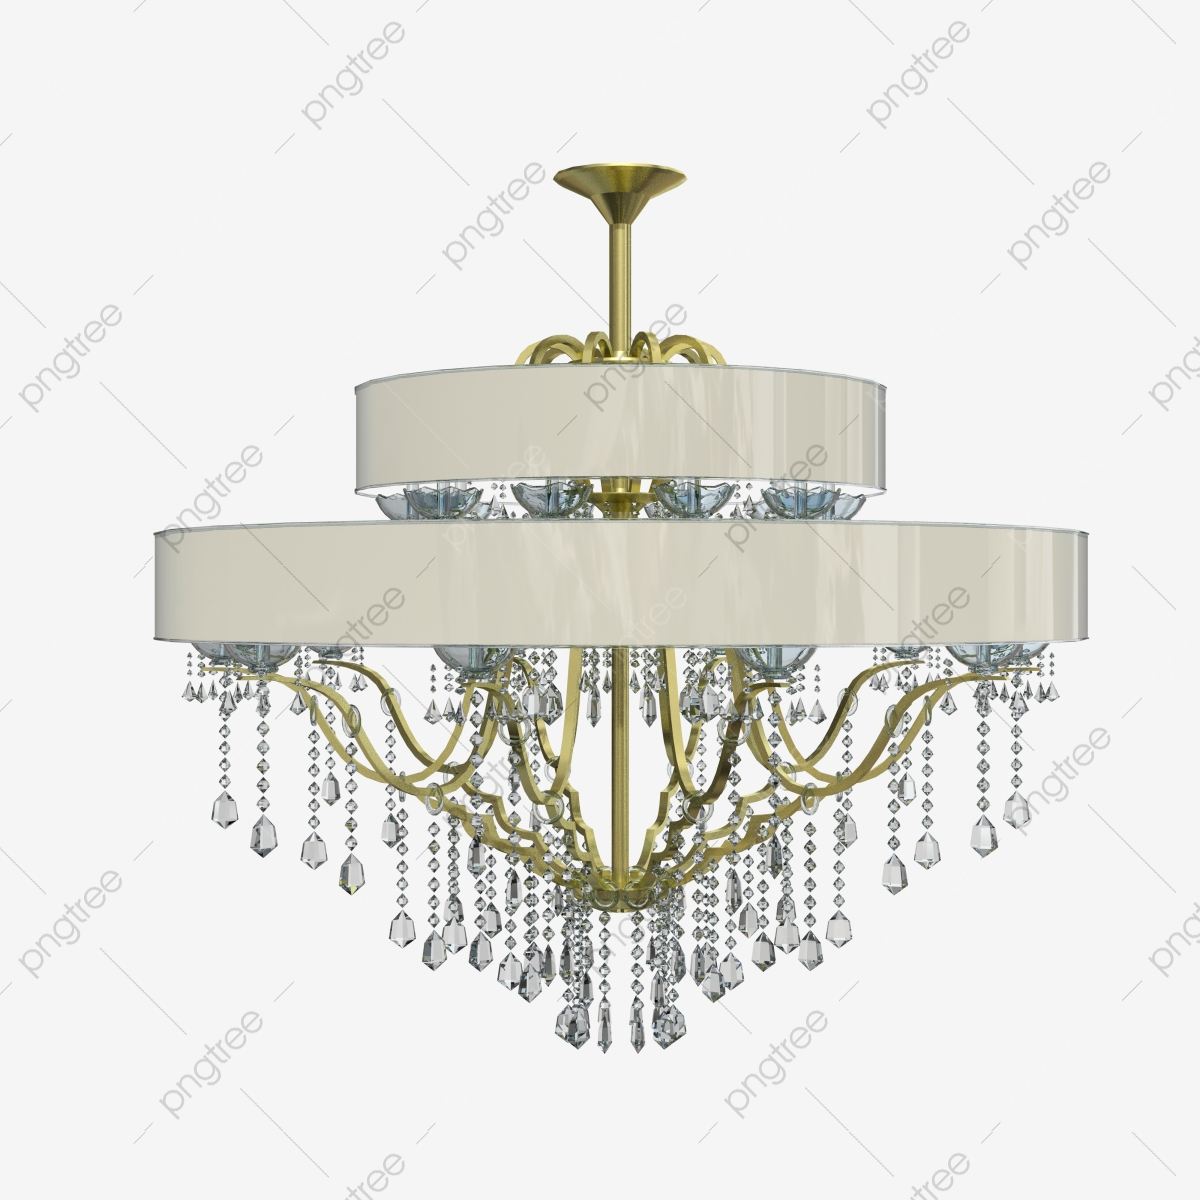 Lighting Crystal Chandeliers Lights